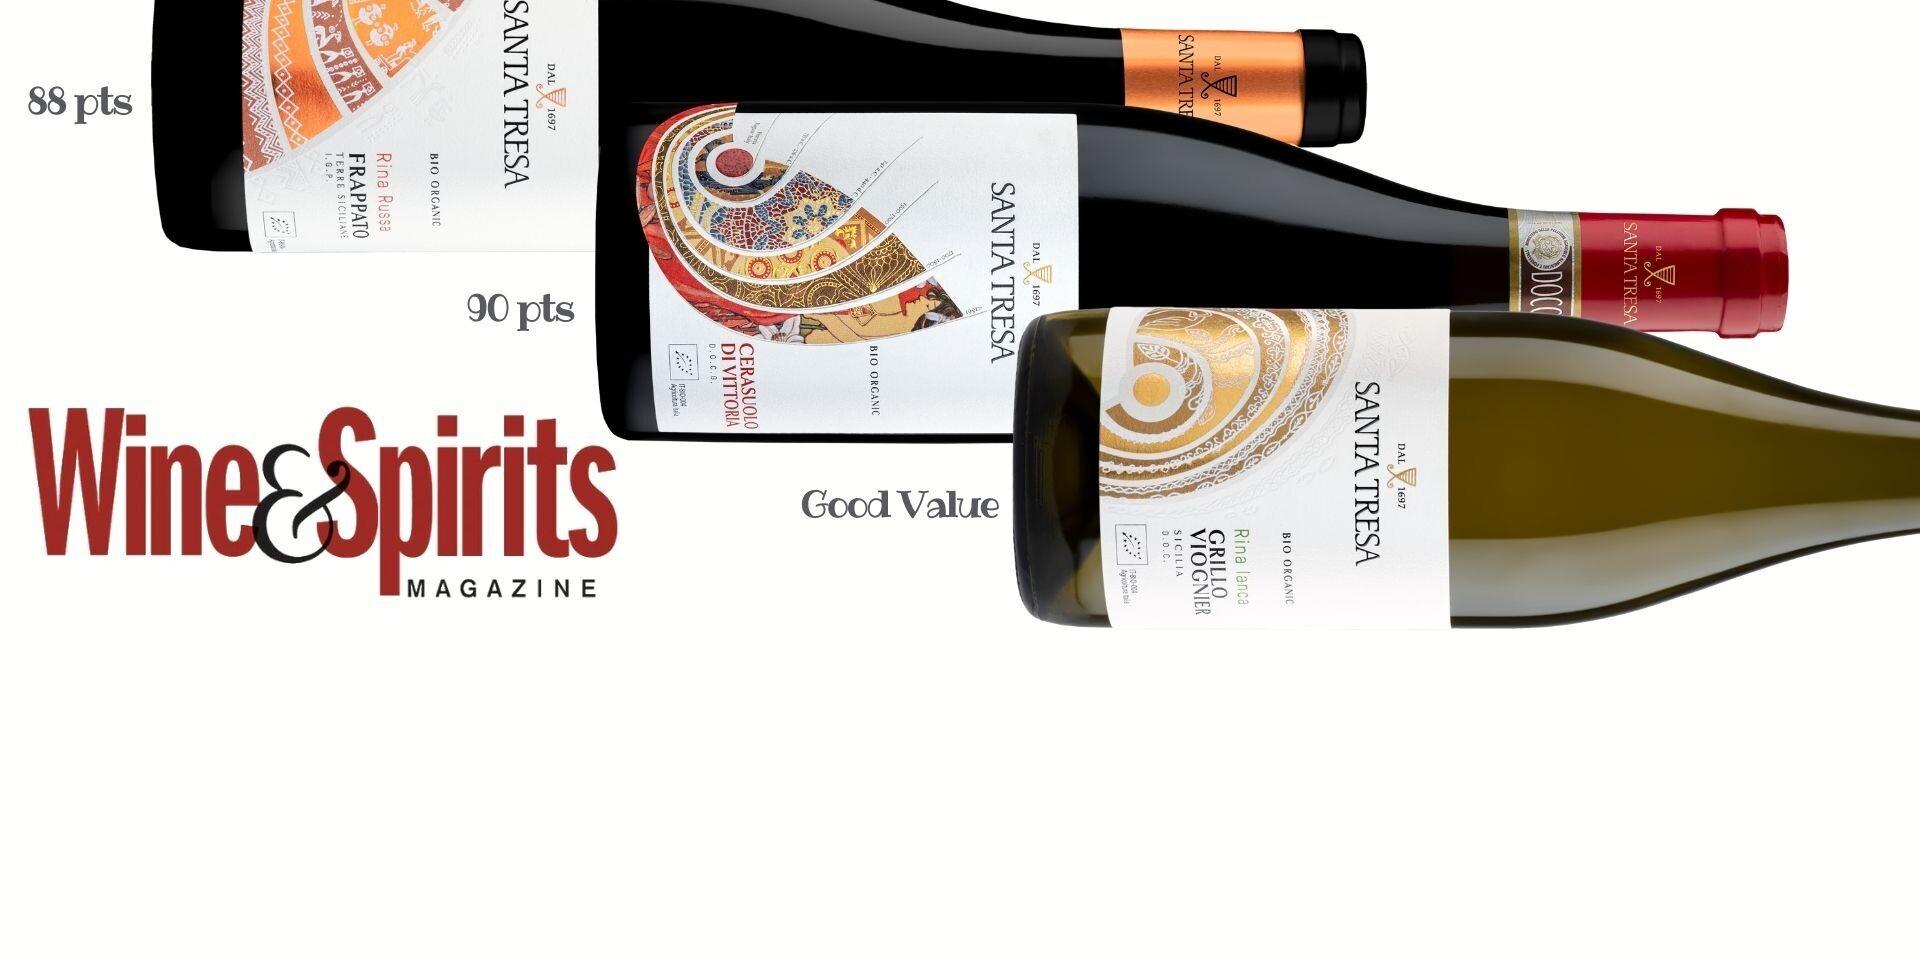 Wine & Spirits USA  - i risultati